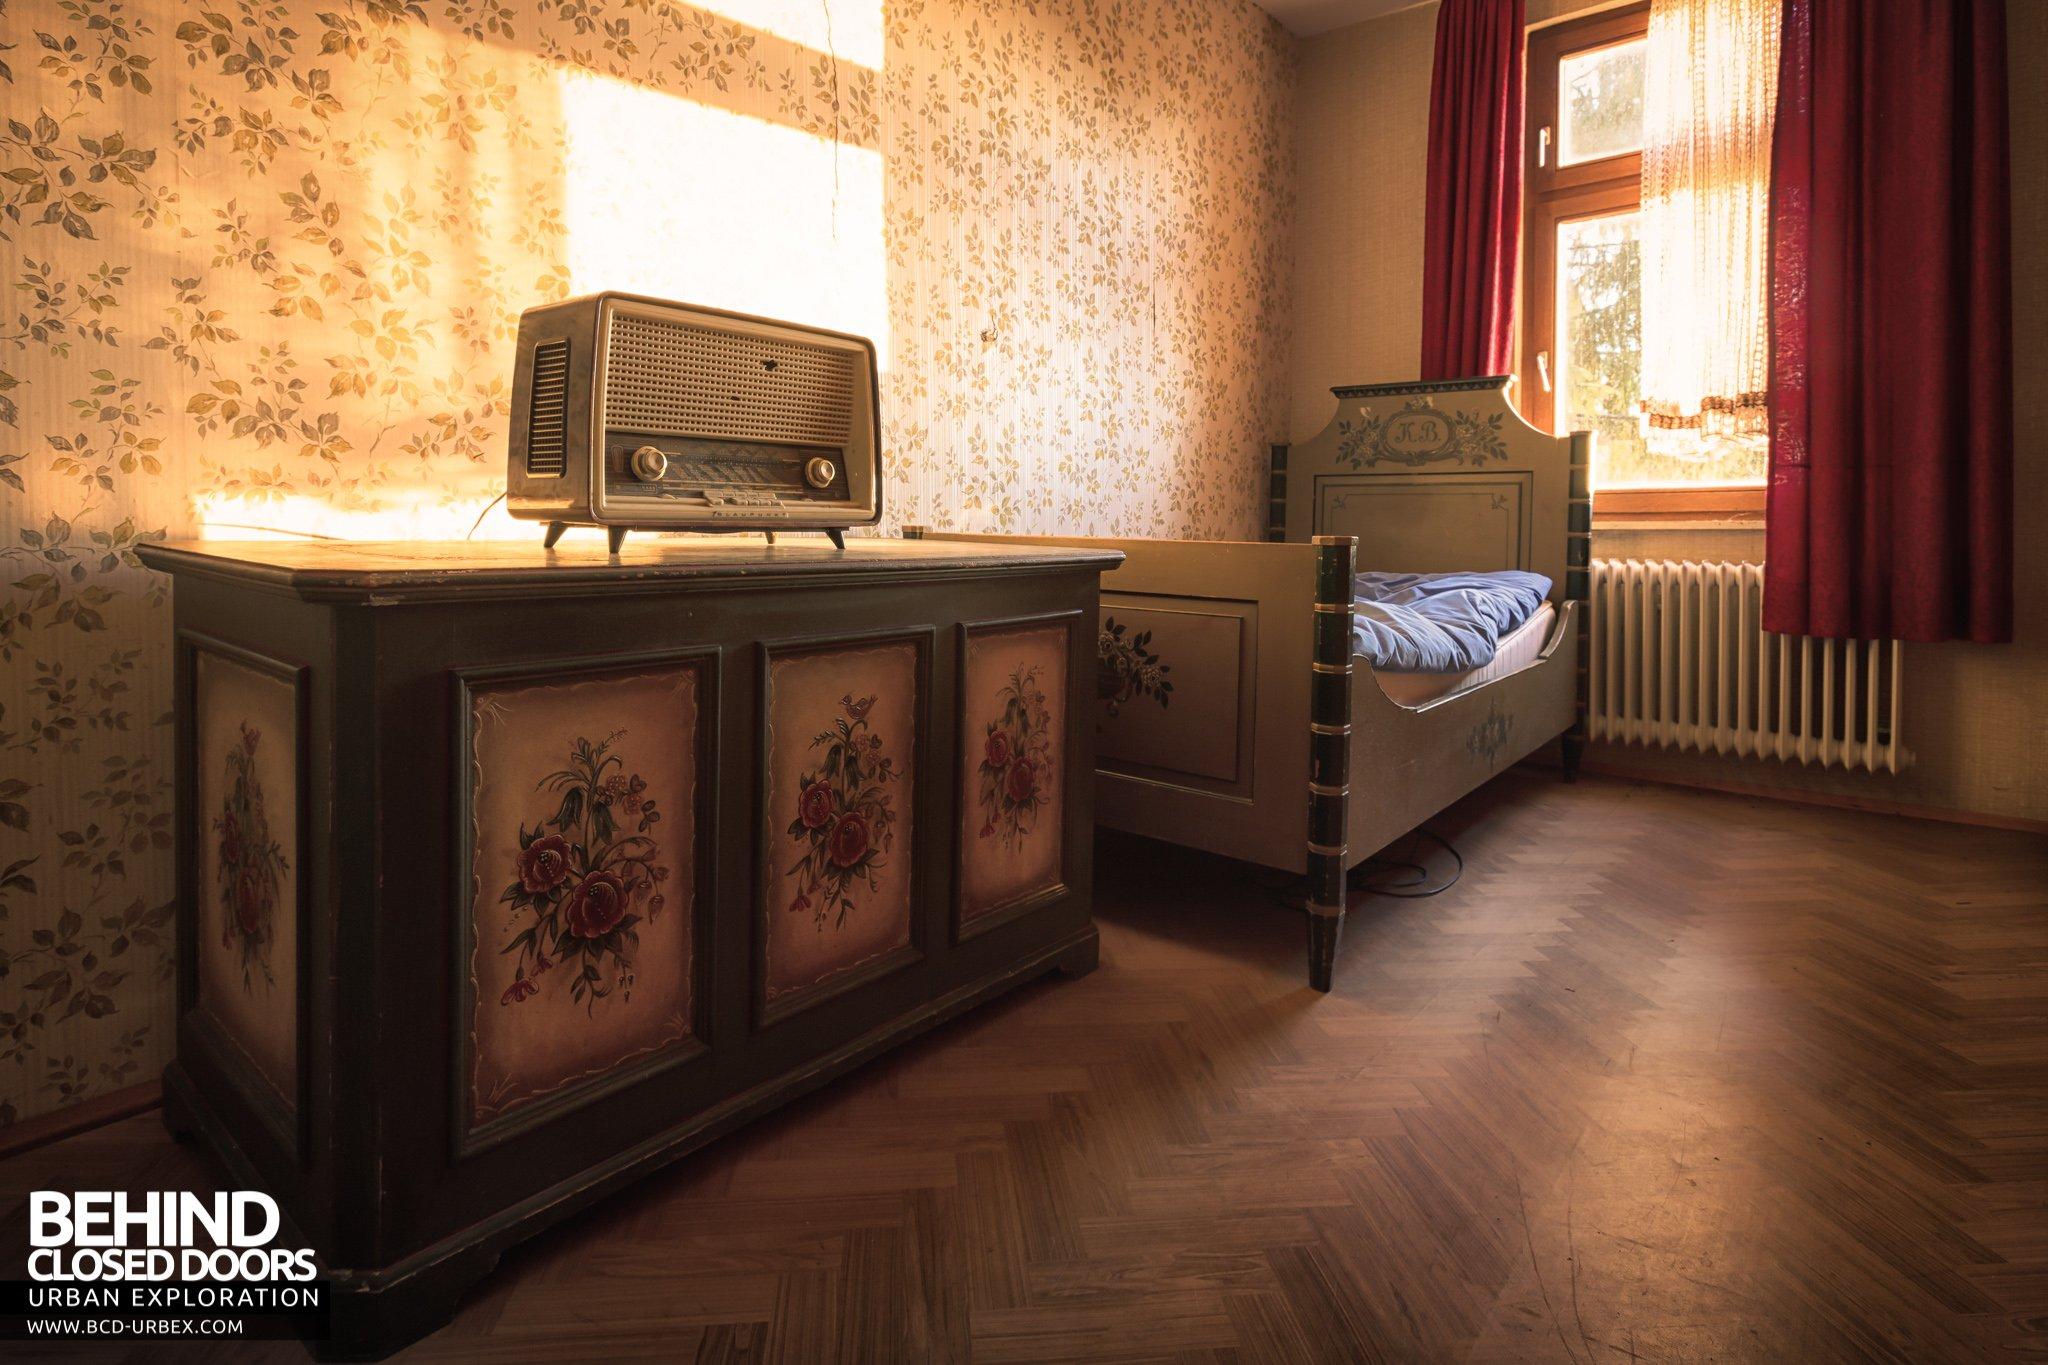 The Hunters Hotel Germany 187 Urbex Behind Closed Doors